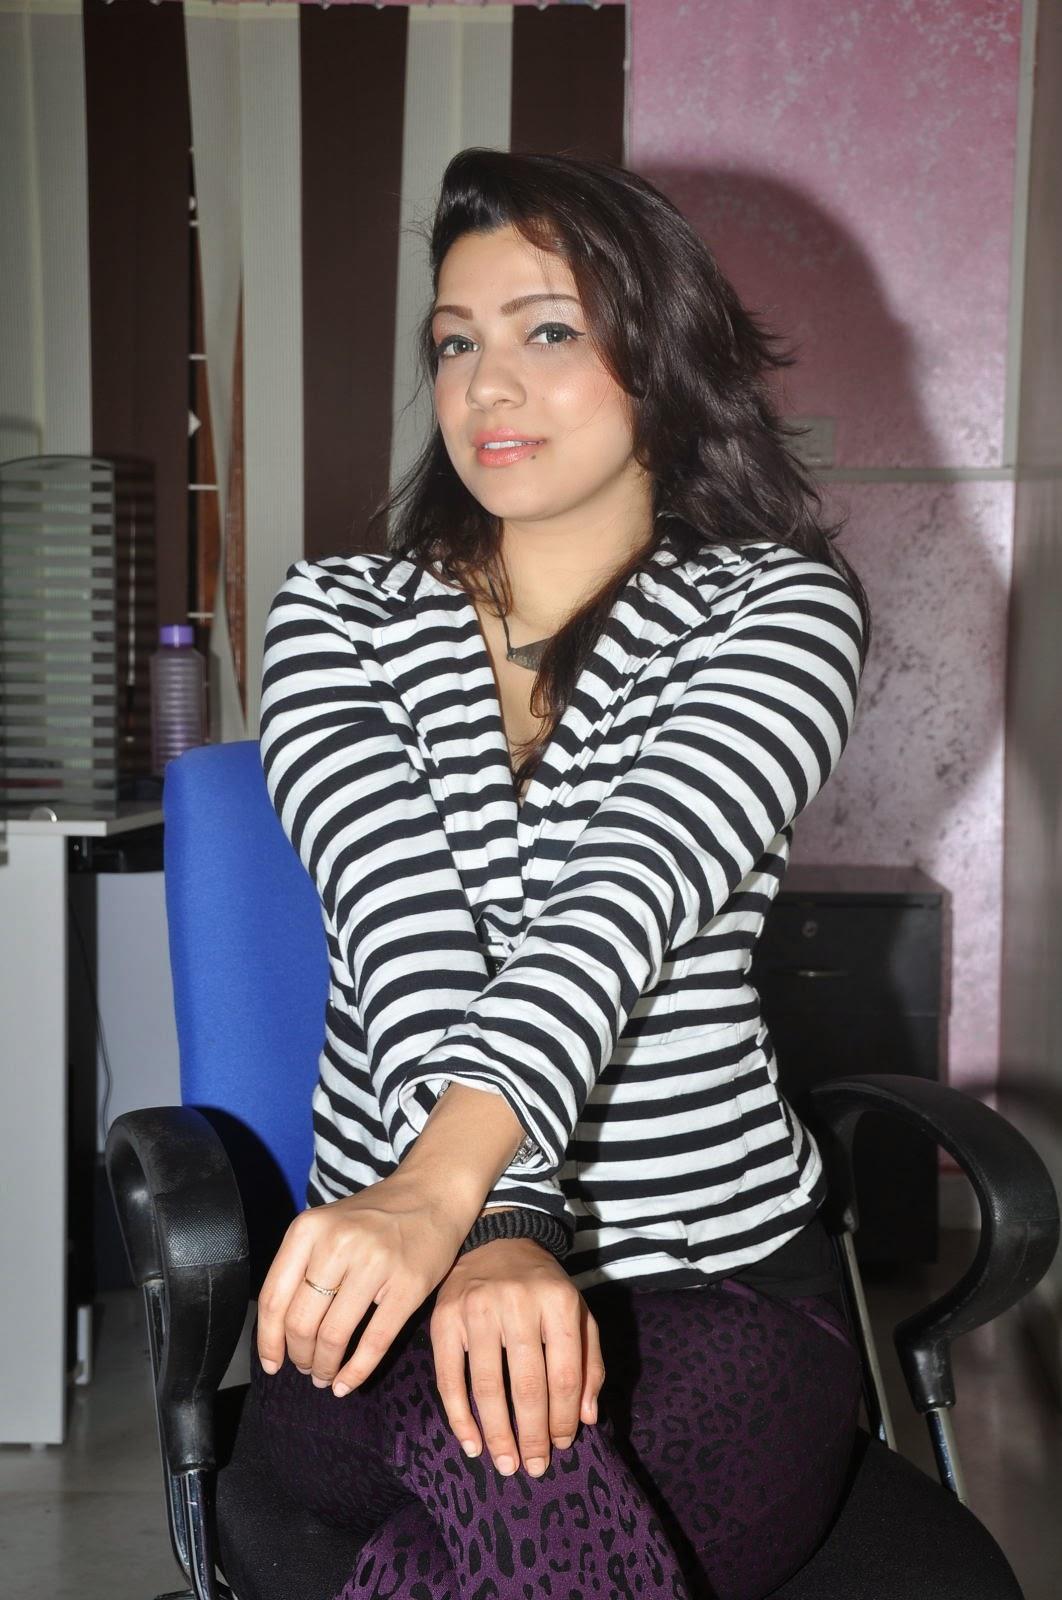 Actress Pari Nidhi Glam photos Gallery-HQ-Photo-2